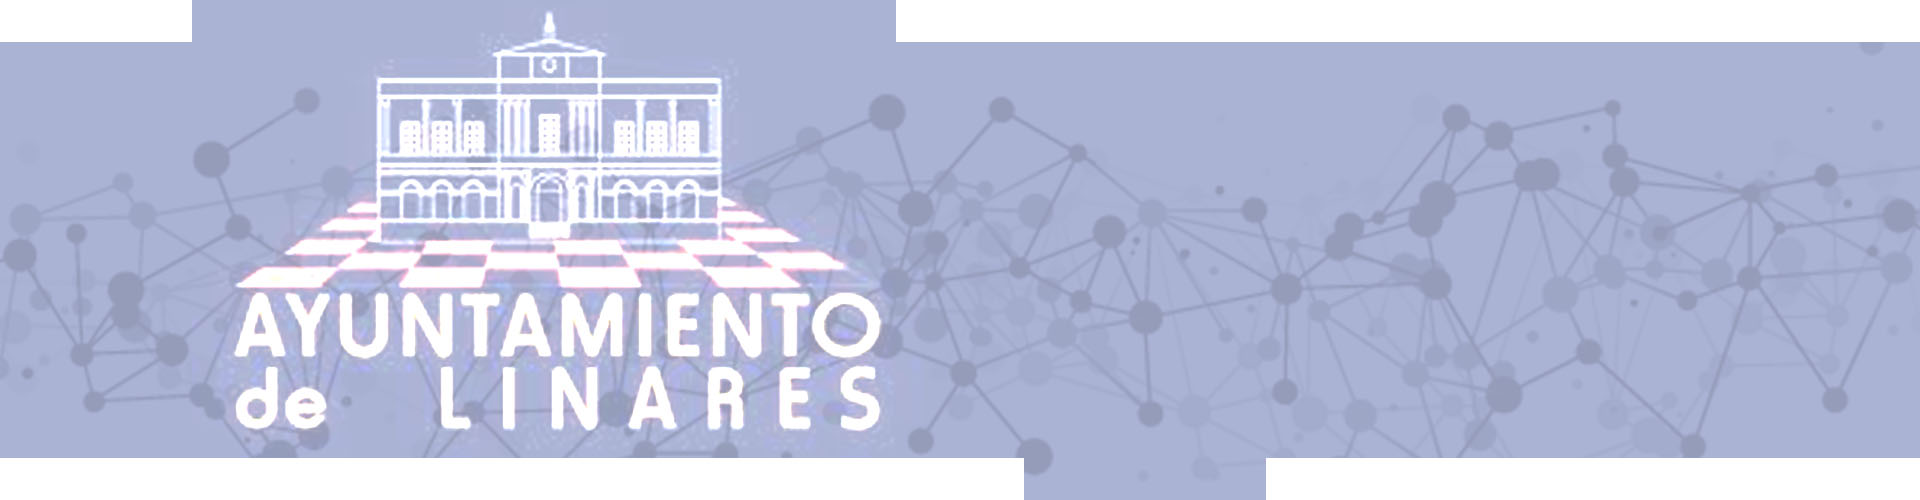 Contratación de programas de formación profesional en Linares 2020-2022